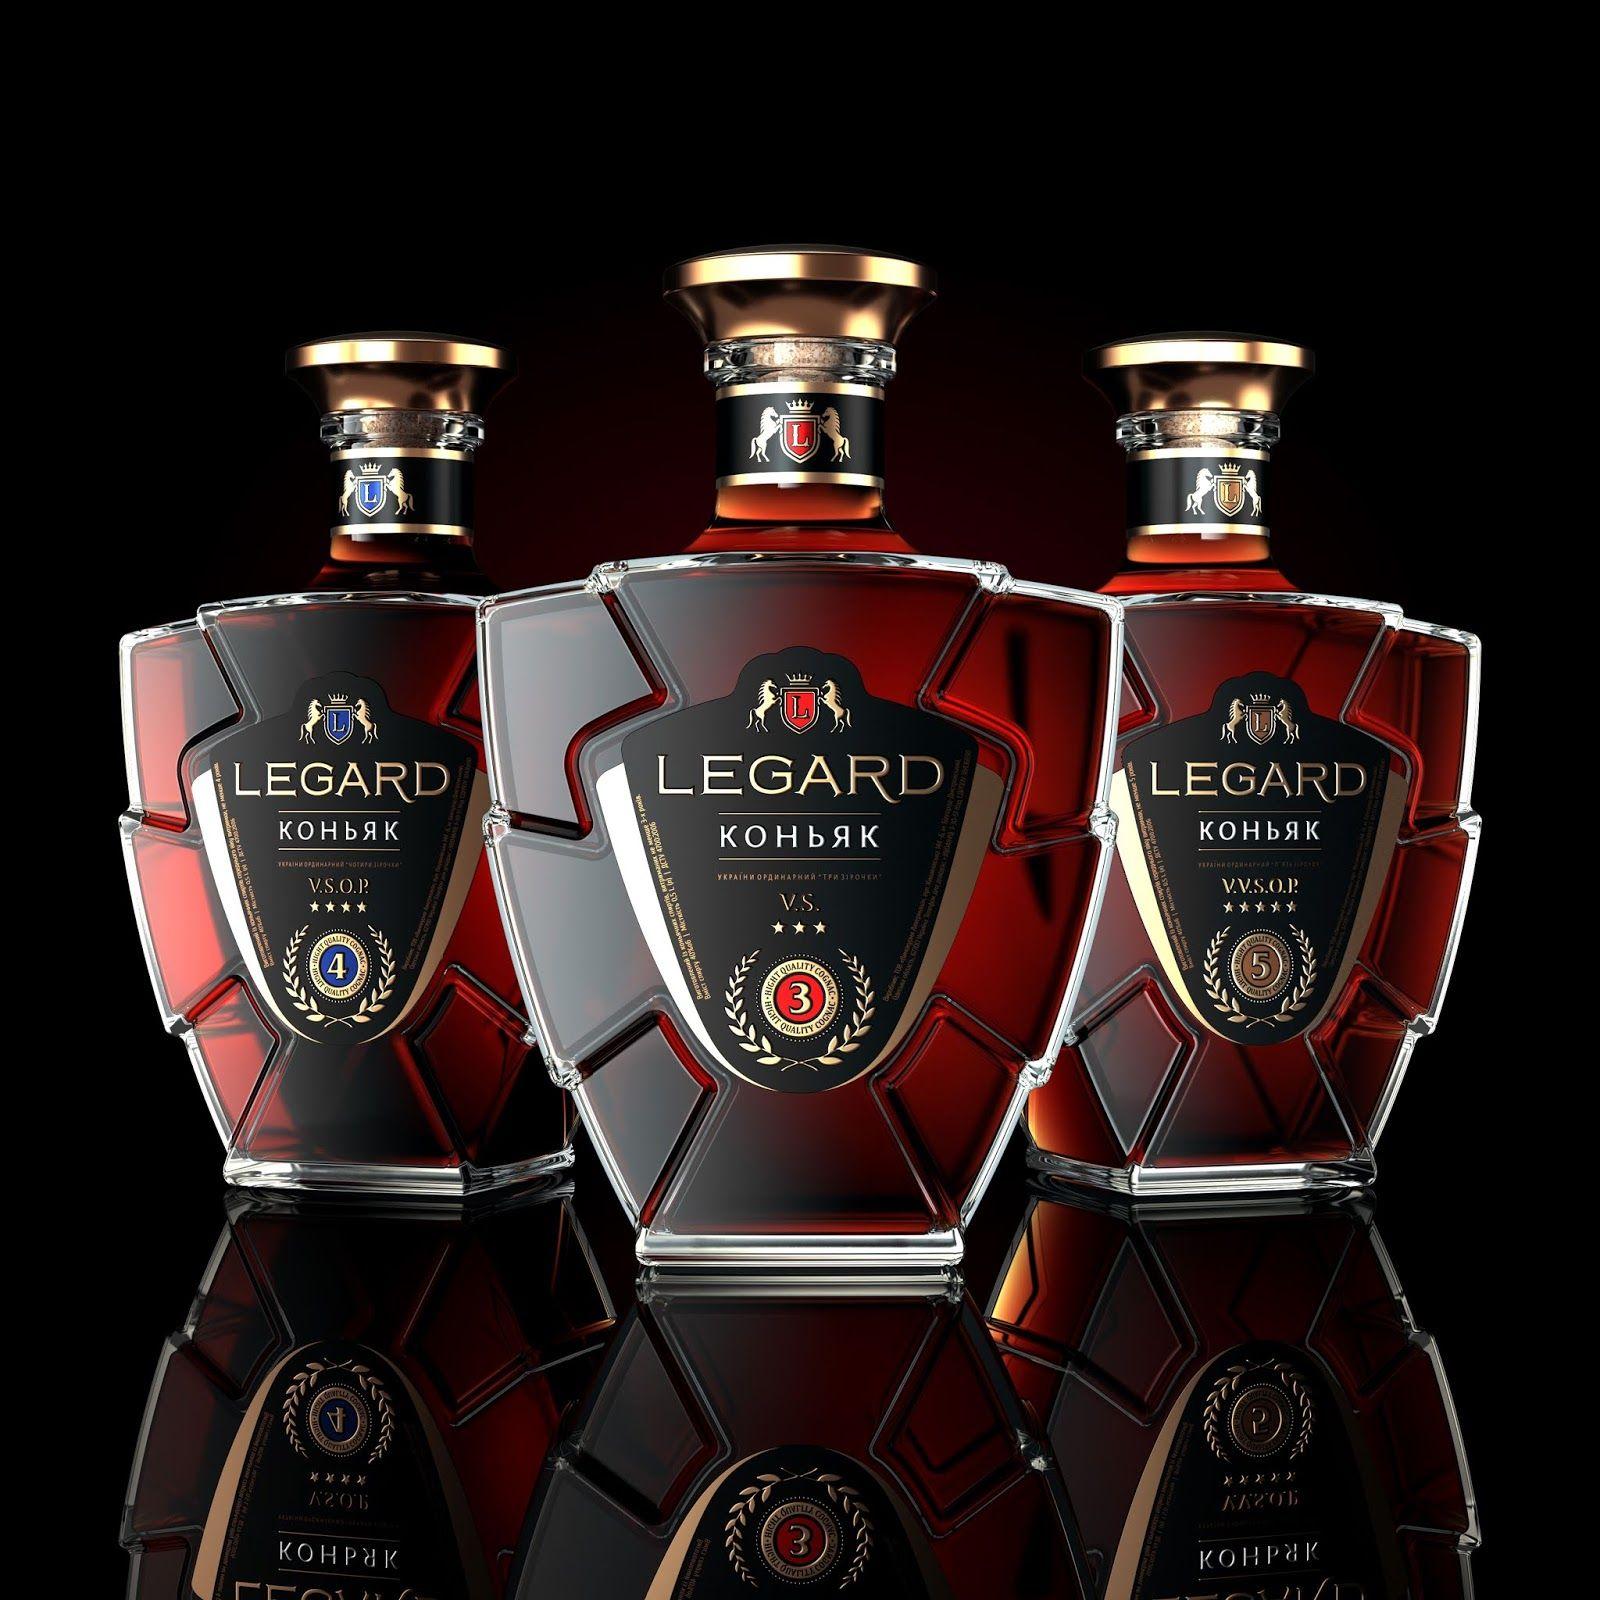 Legard Brandy In 2020 Alcohol Marketing Whiskey Packaging Branding Design